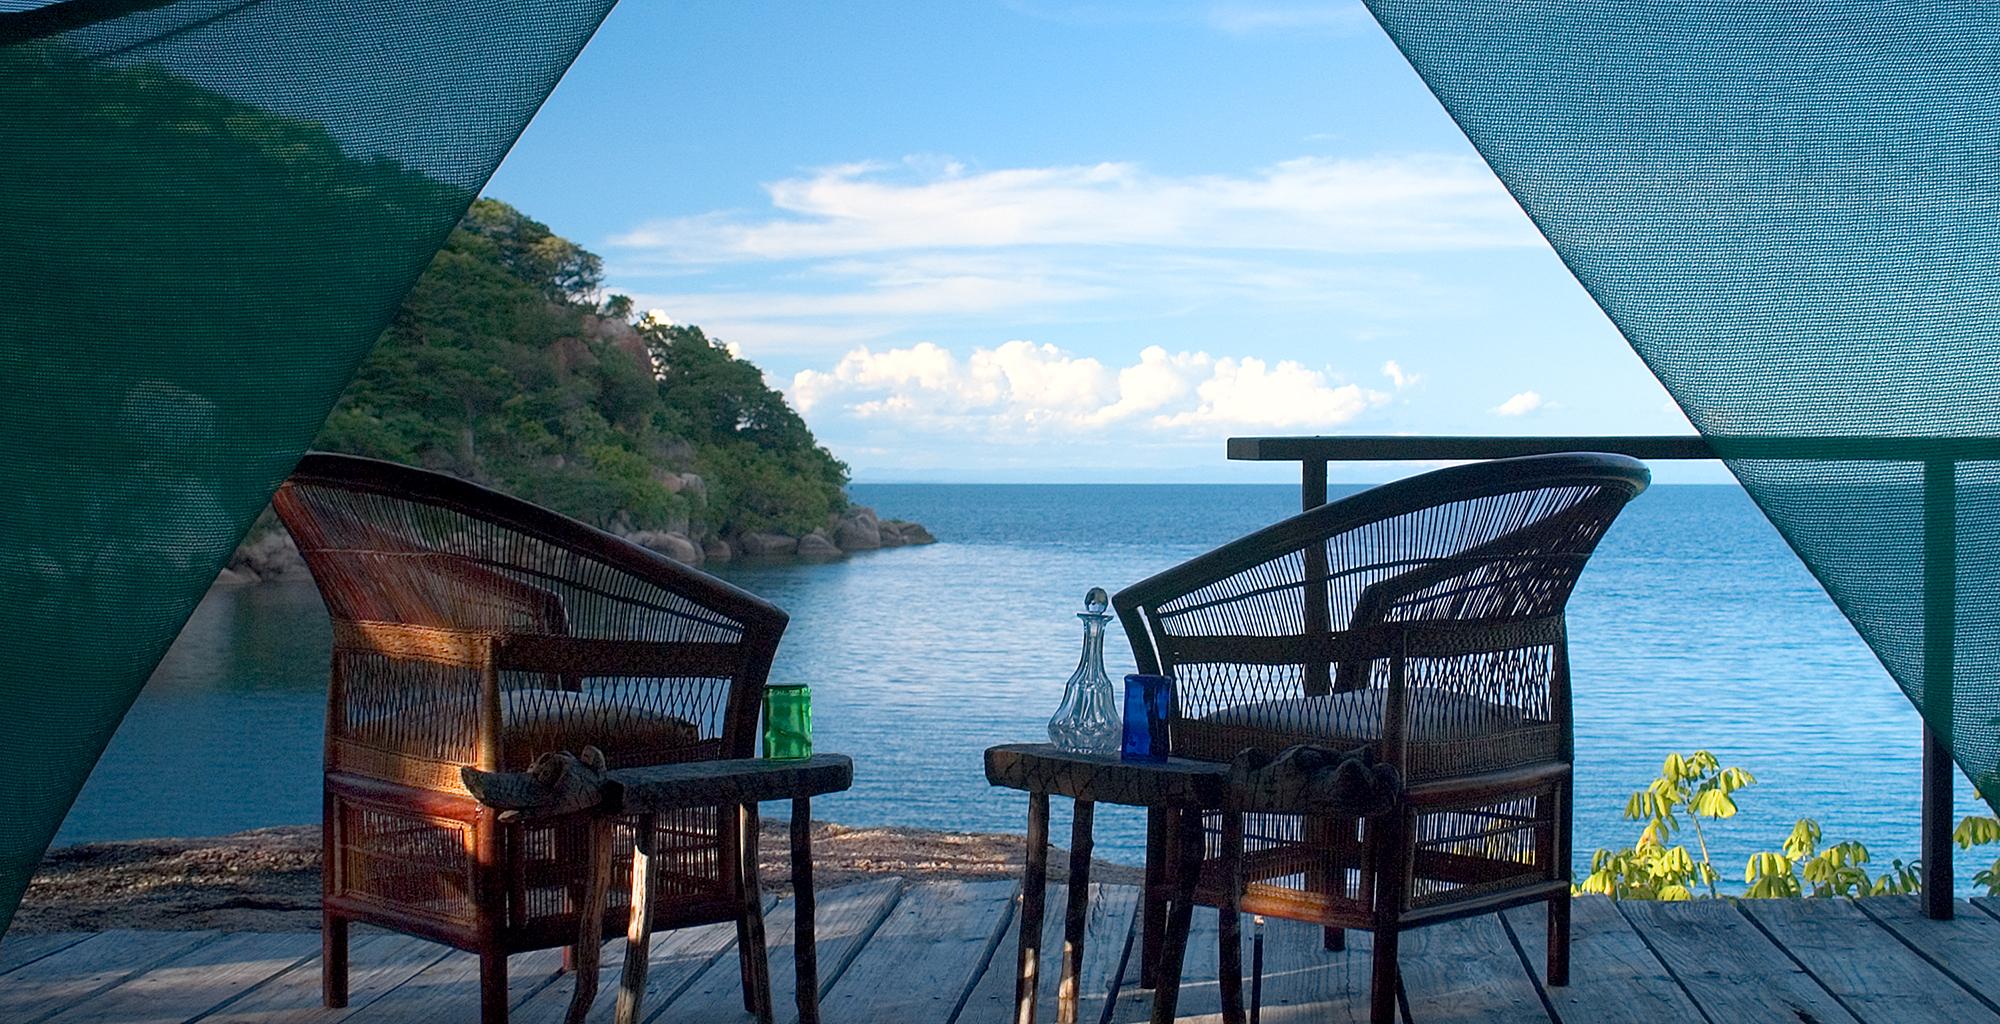 Lake-Malawi-Mumbo-Island-Lodge-Deck-View